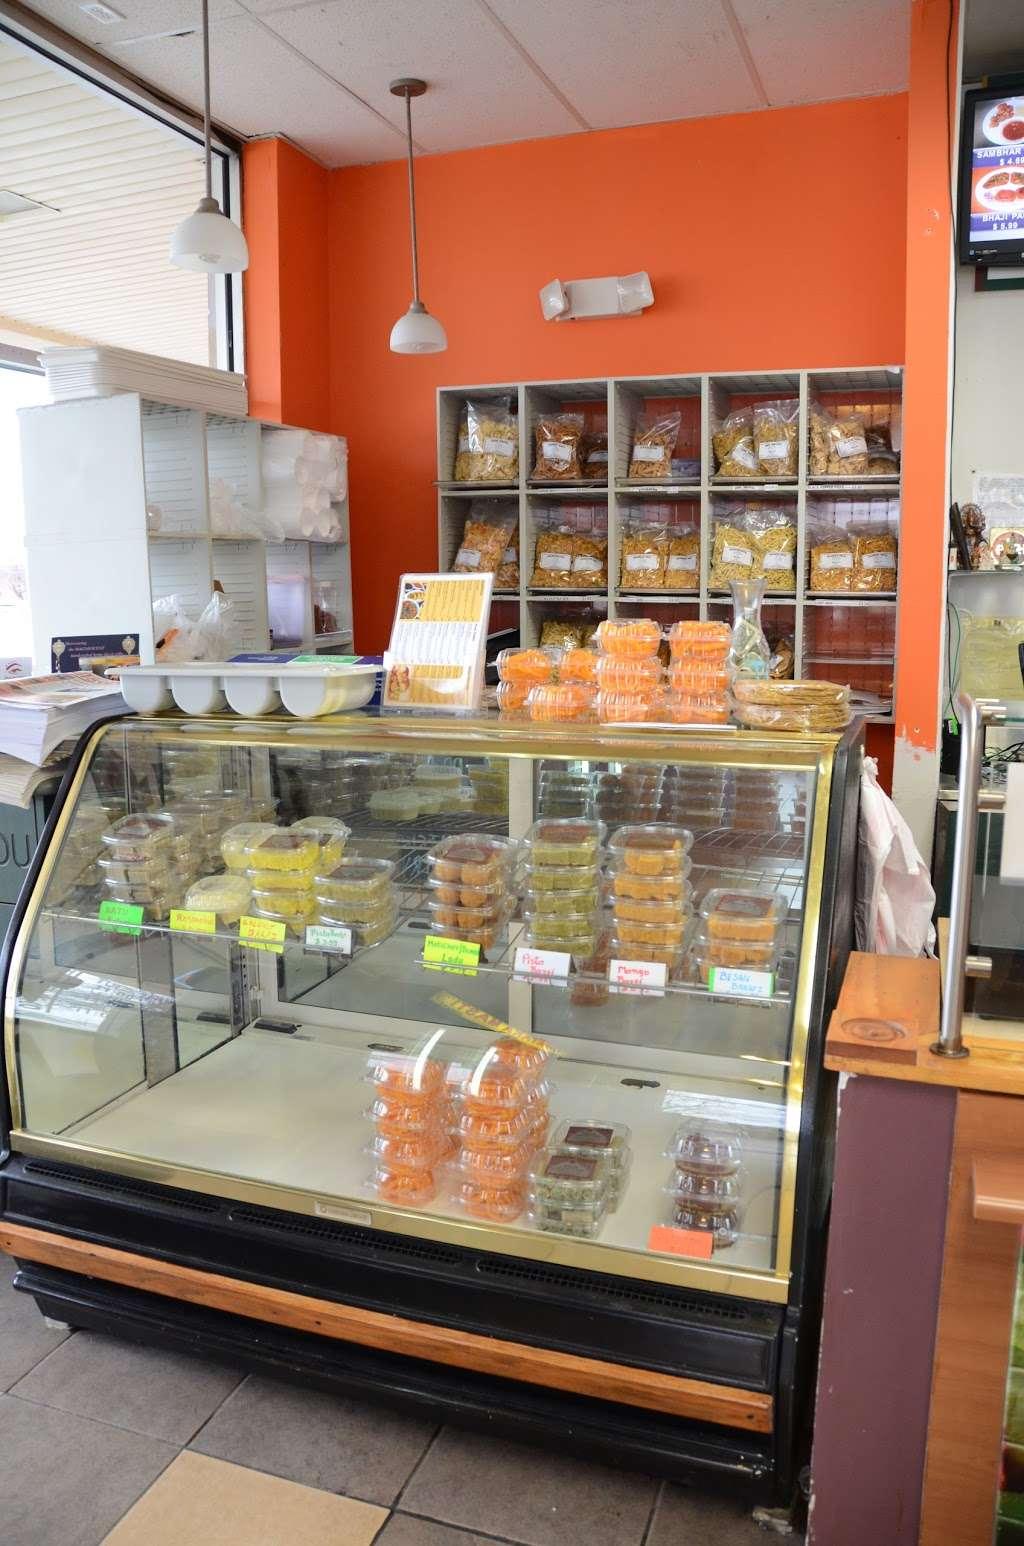 Chataka Masti Indian Grill - restaurant  | Photo 10 of 10 | Address: 888 S. Rt 59 #108, Naperville, IL 60540, USA | Phone: (630) 922-5880